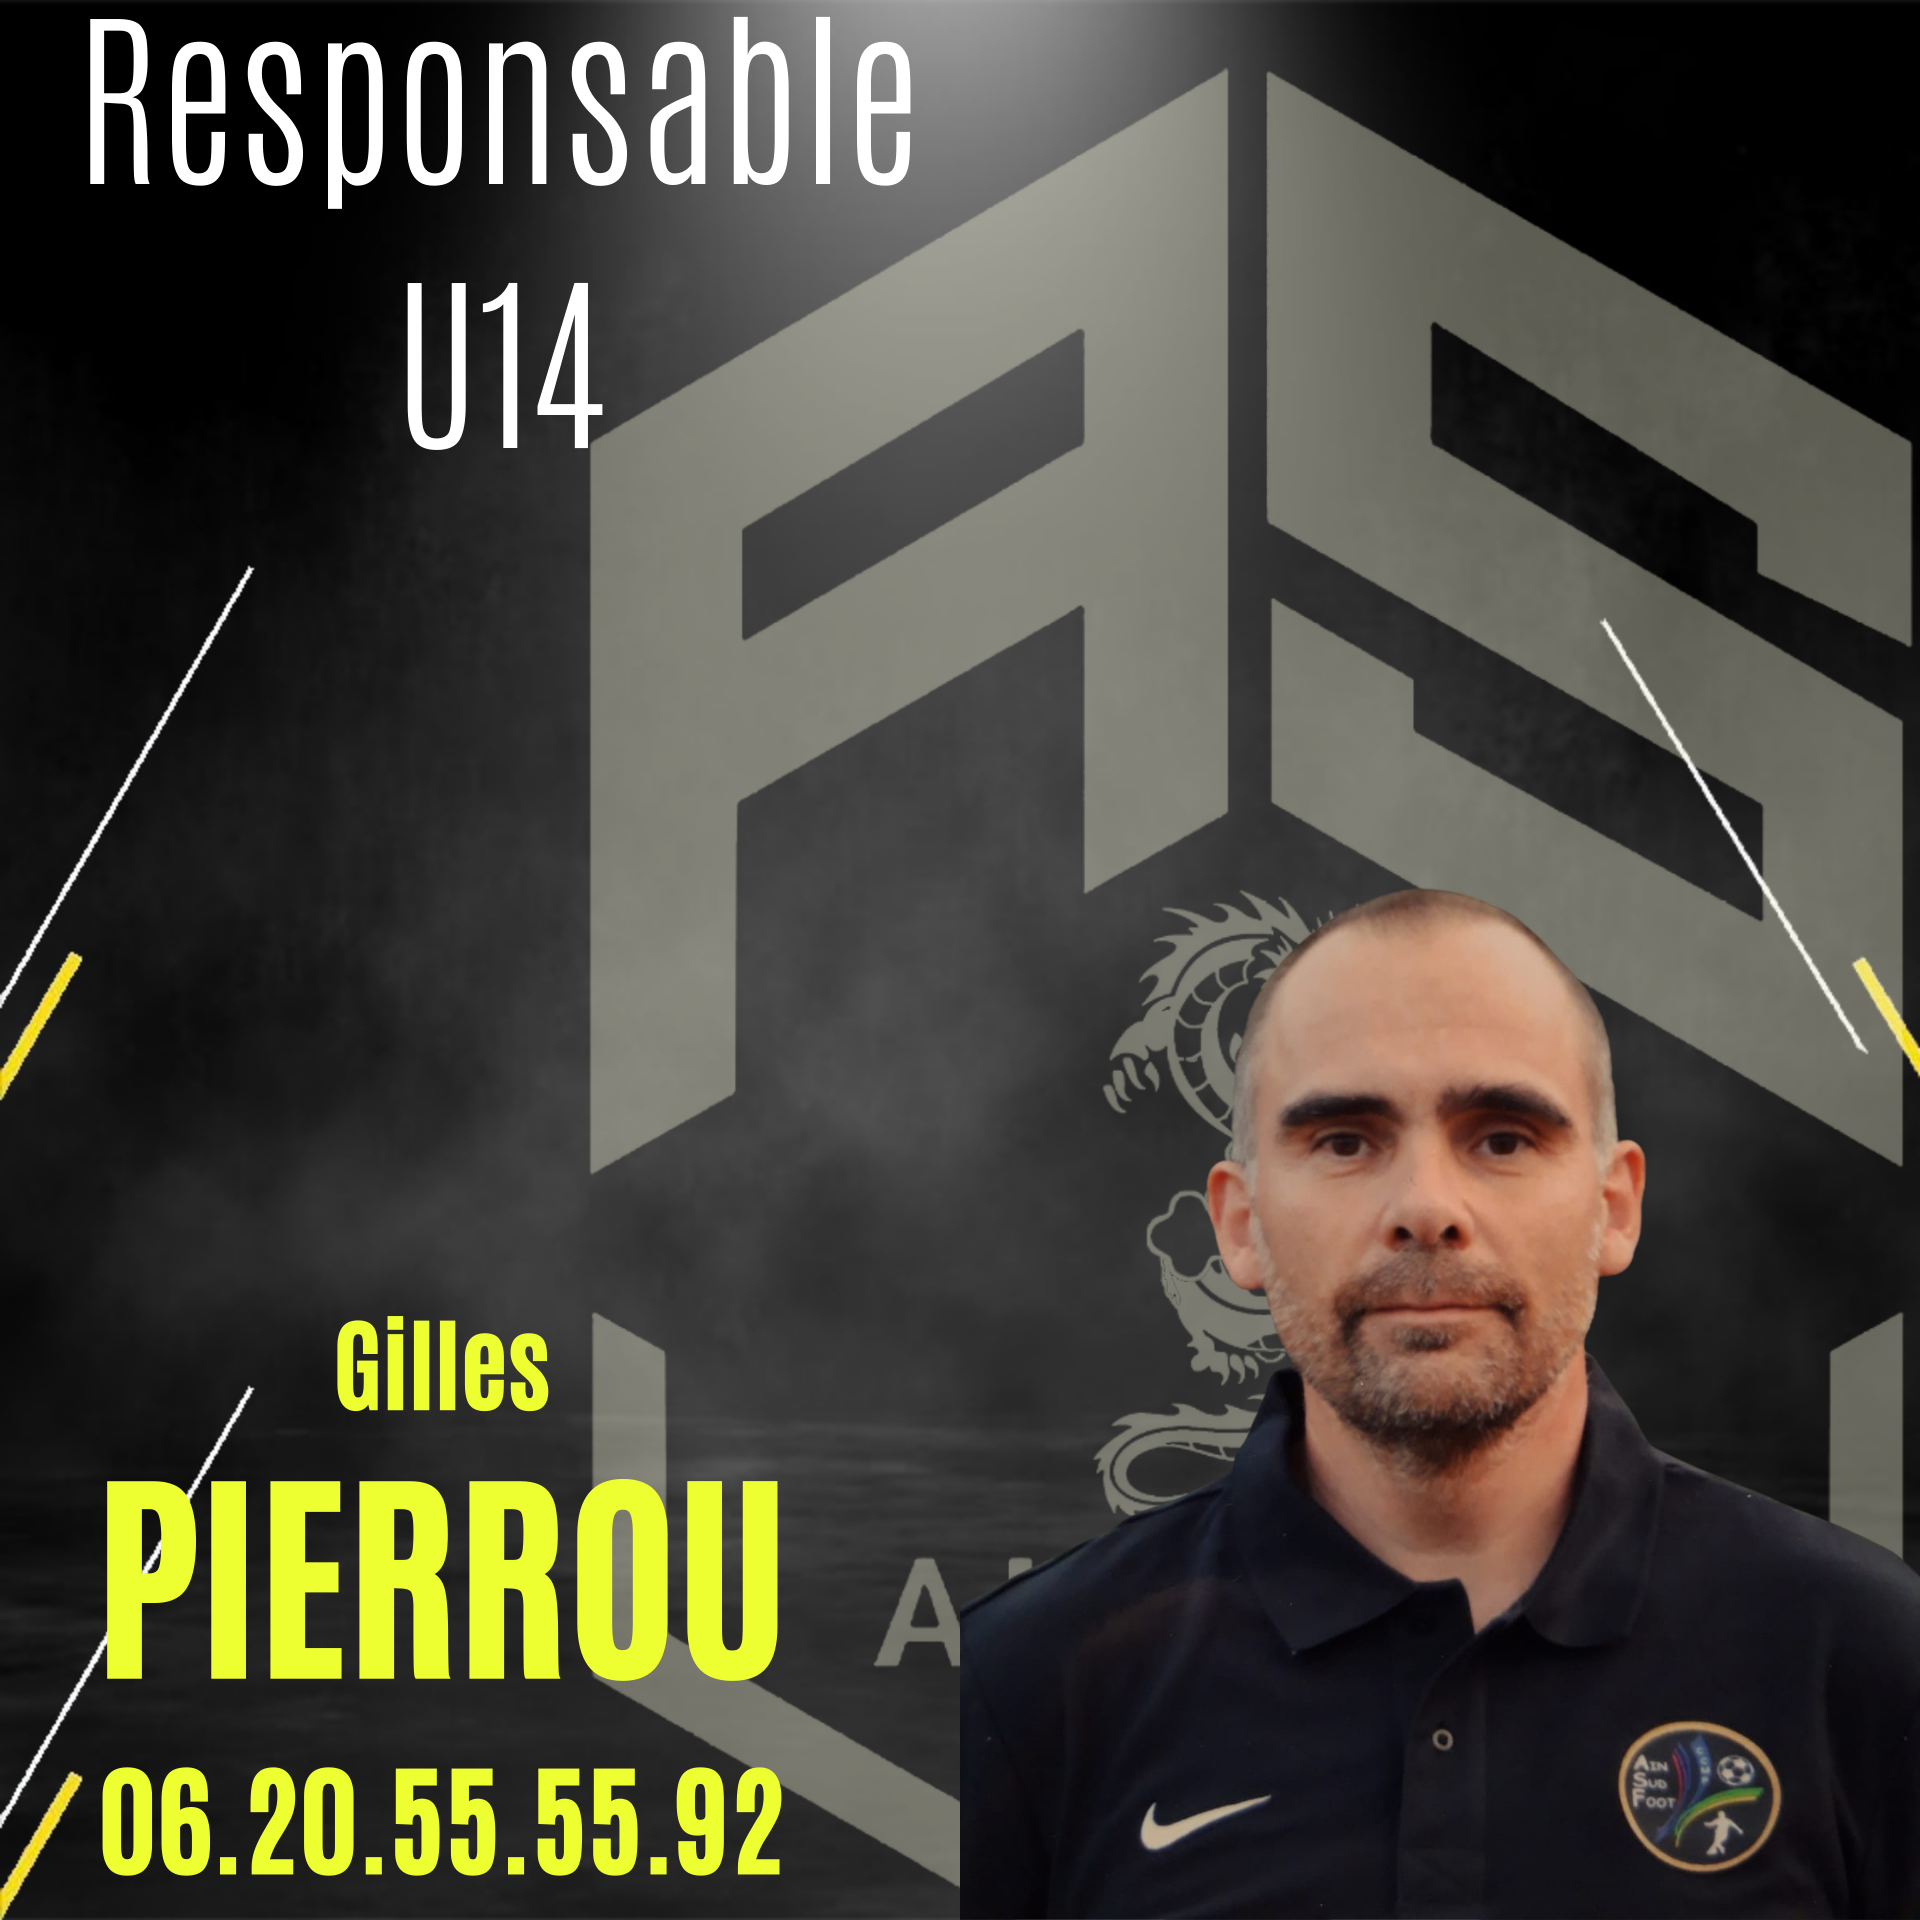 GPIERROU.png